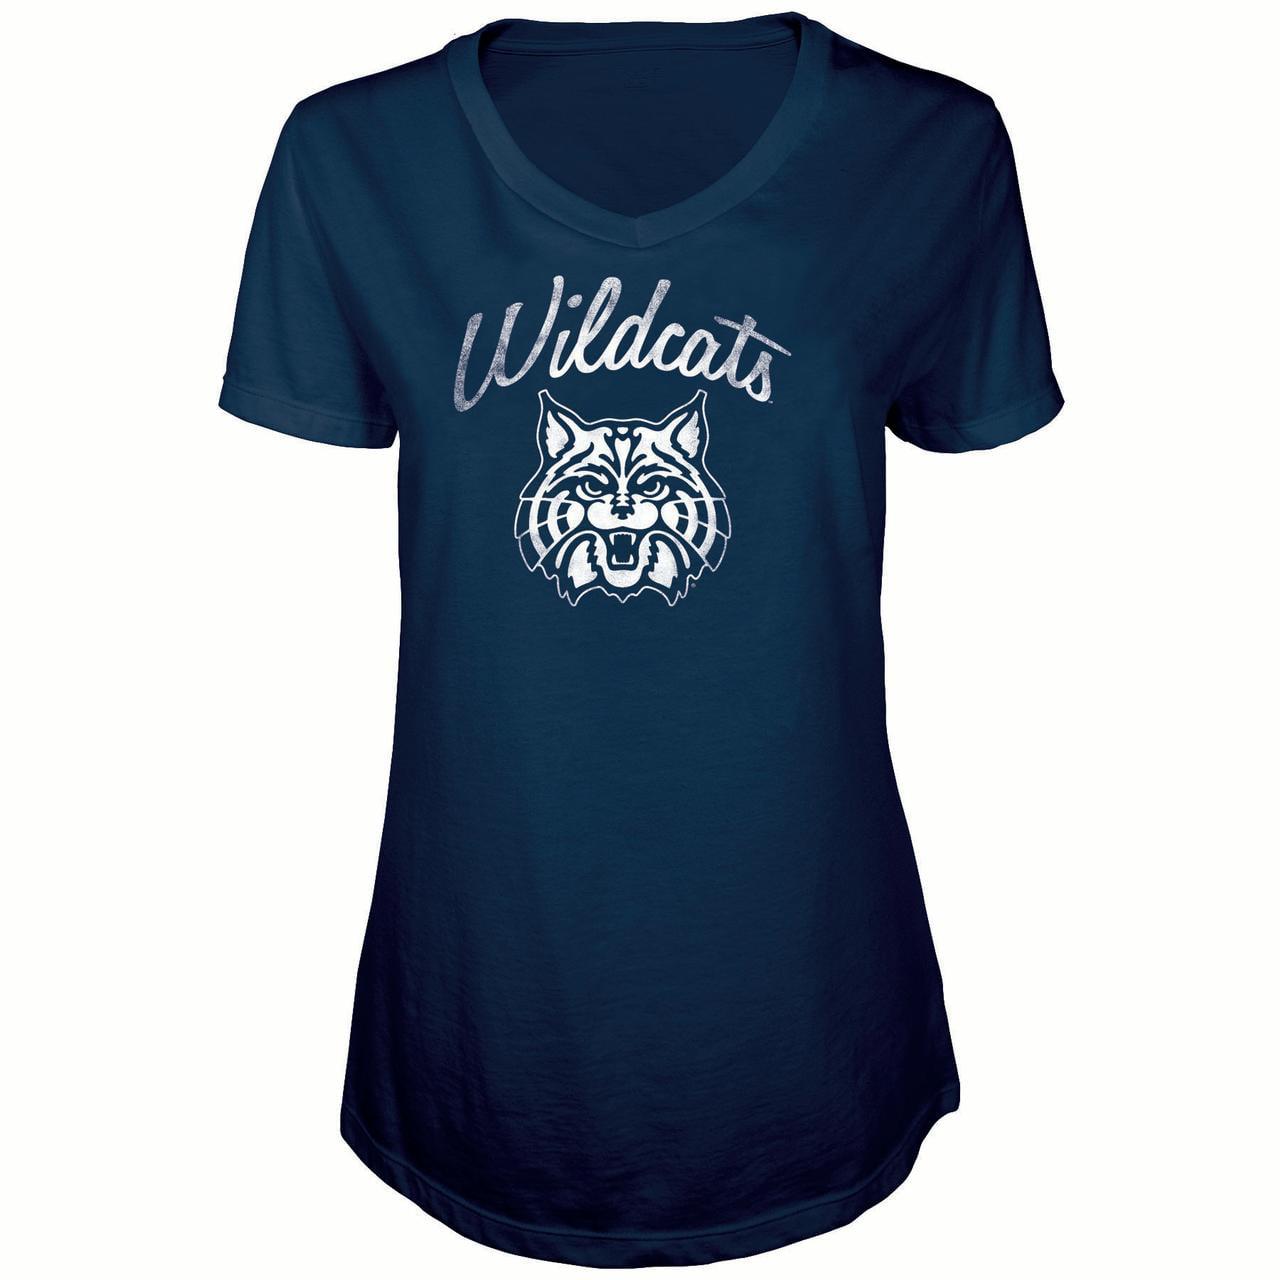 Women's Russell Navy Arizona Wildcats Distressed V-Neck Tunic T-Shirt